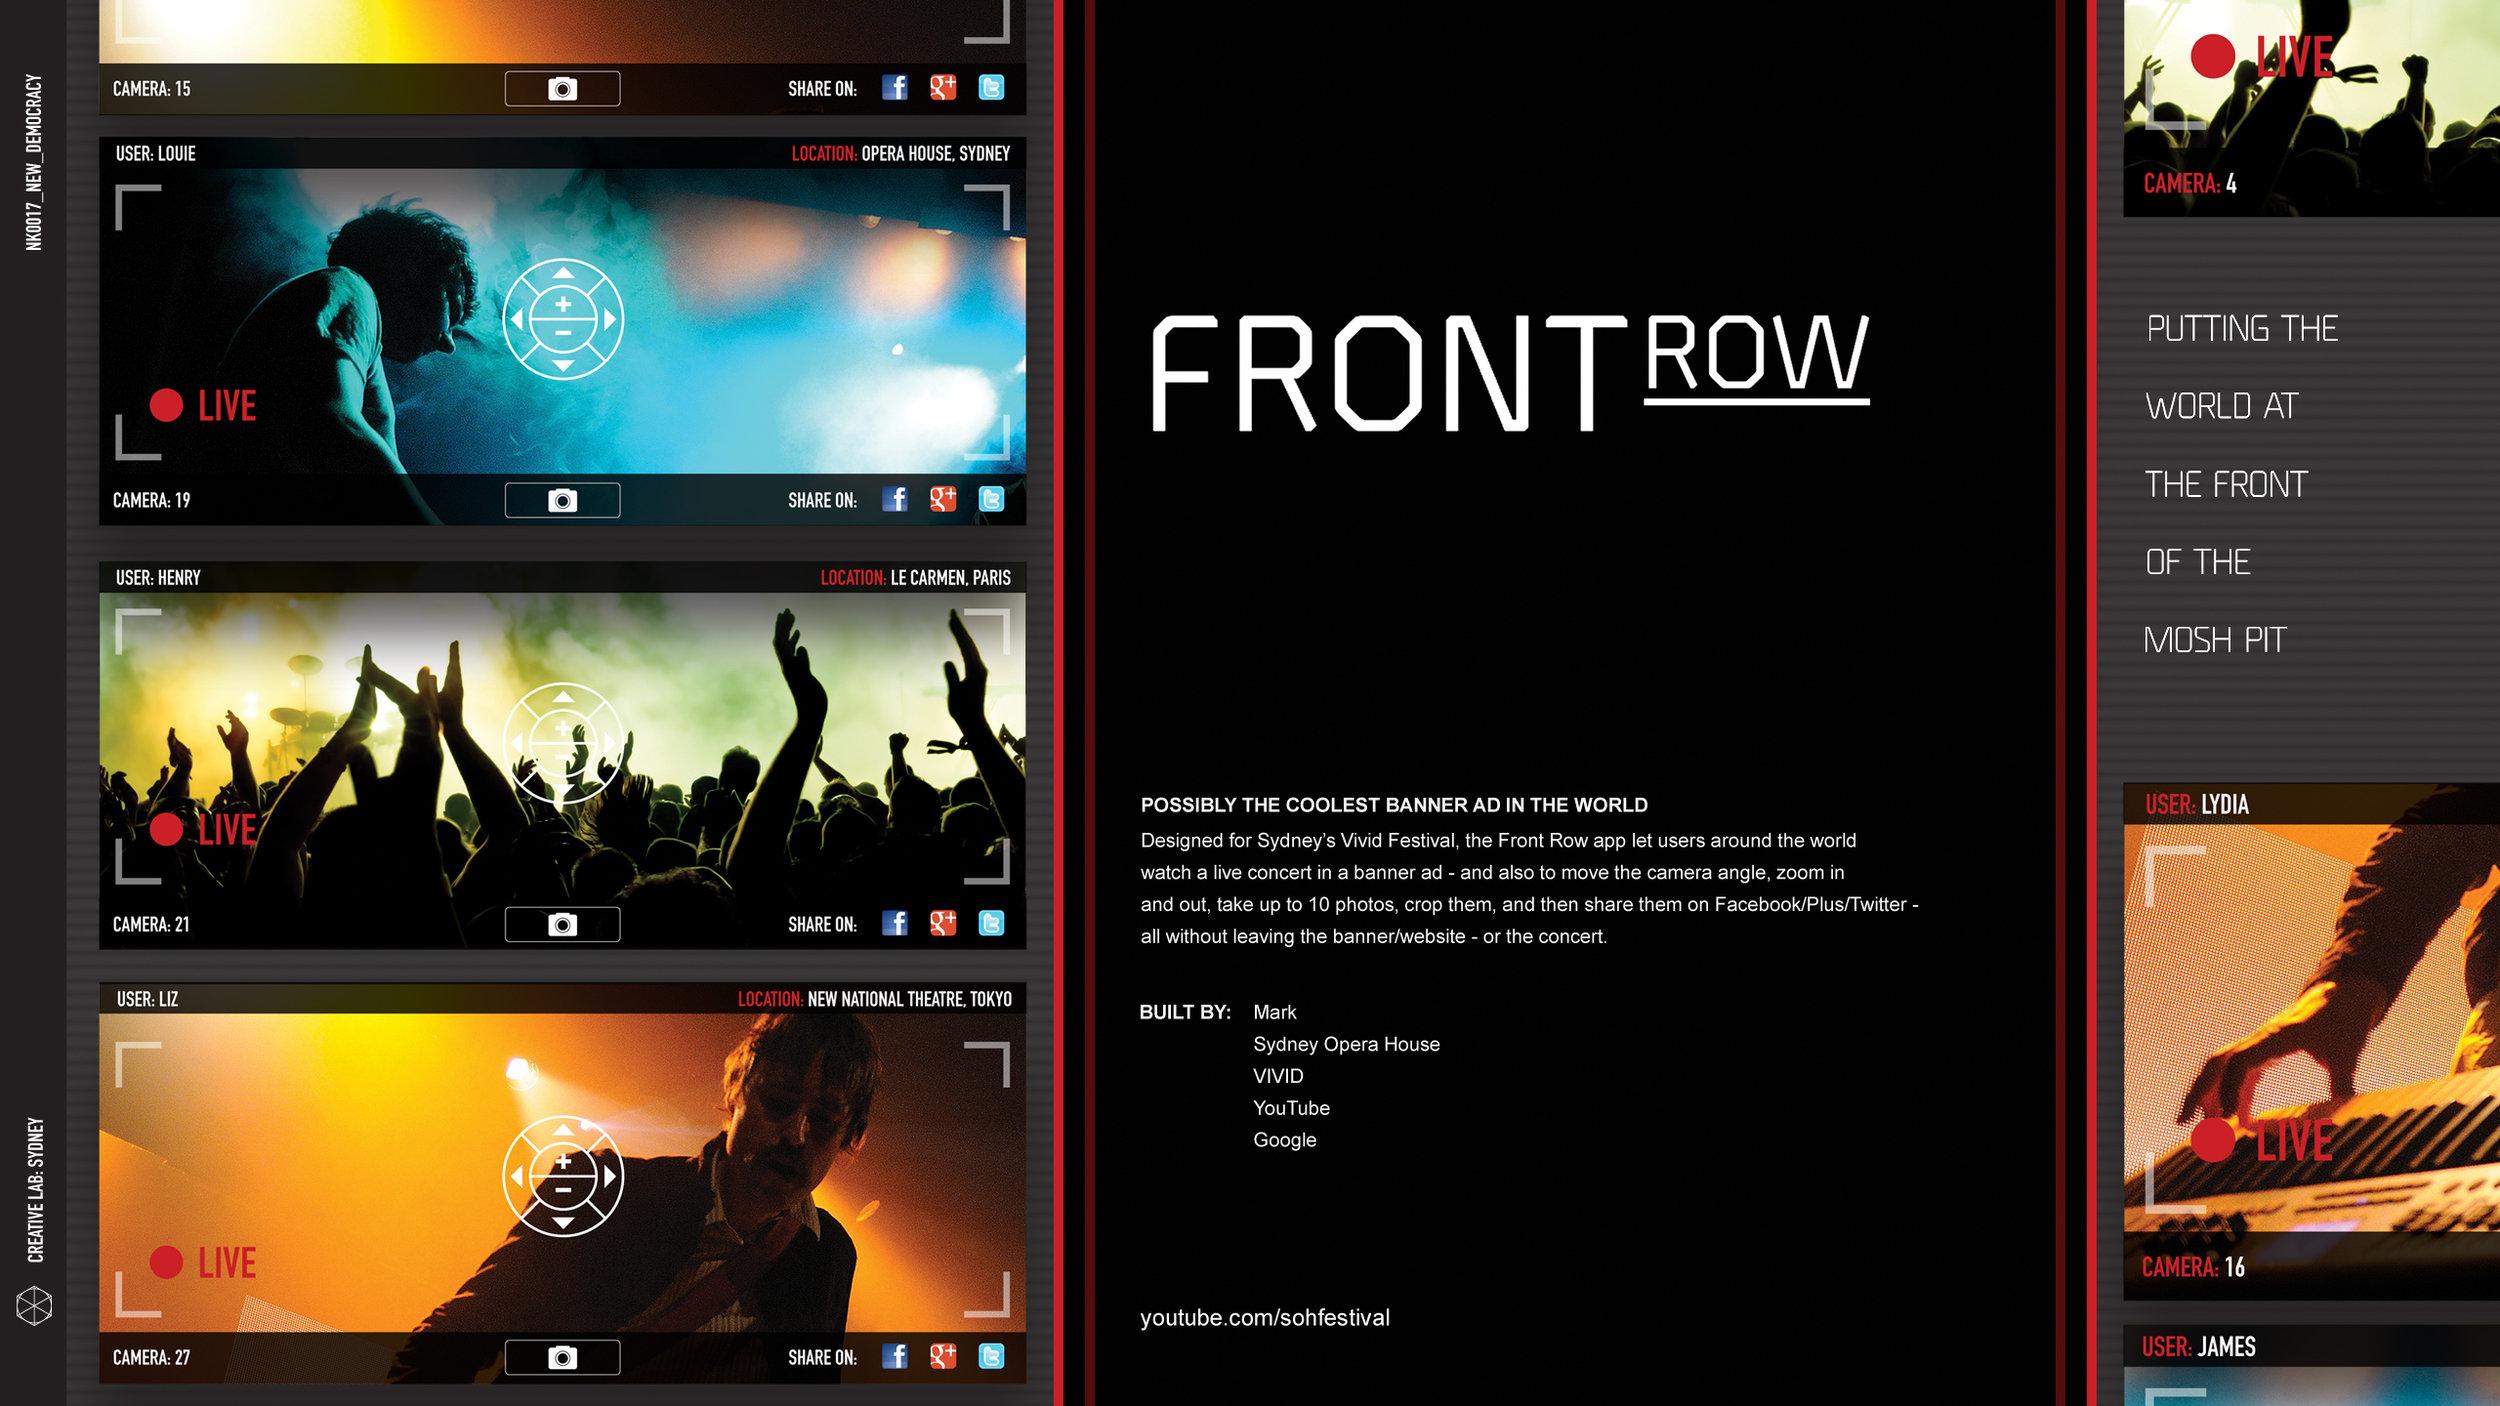 NK0025 - Front Row_Screen01.jpg